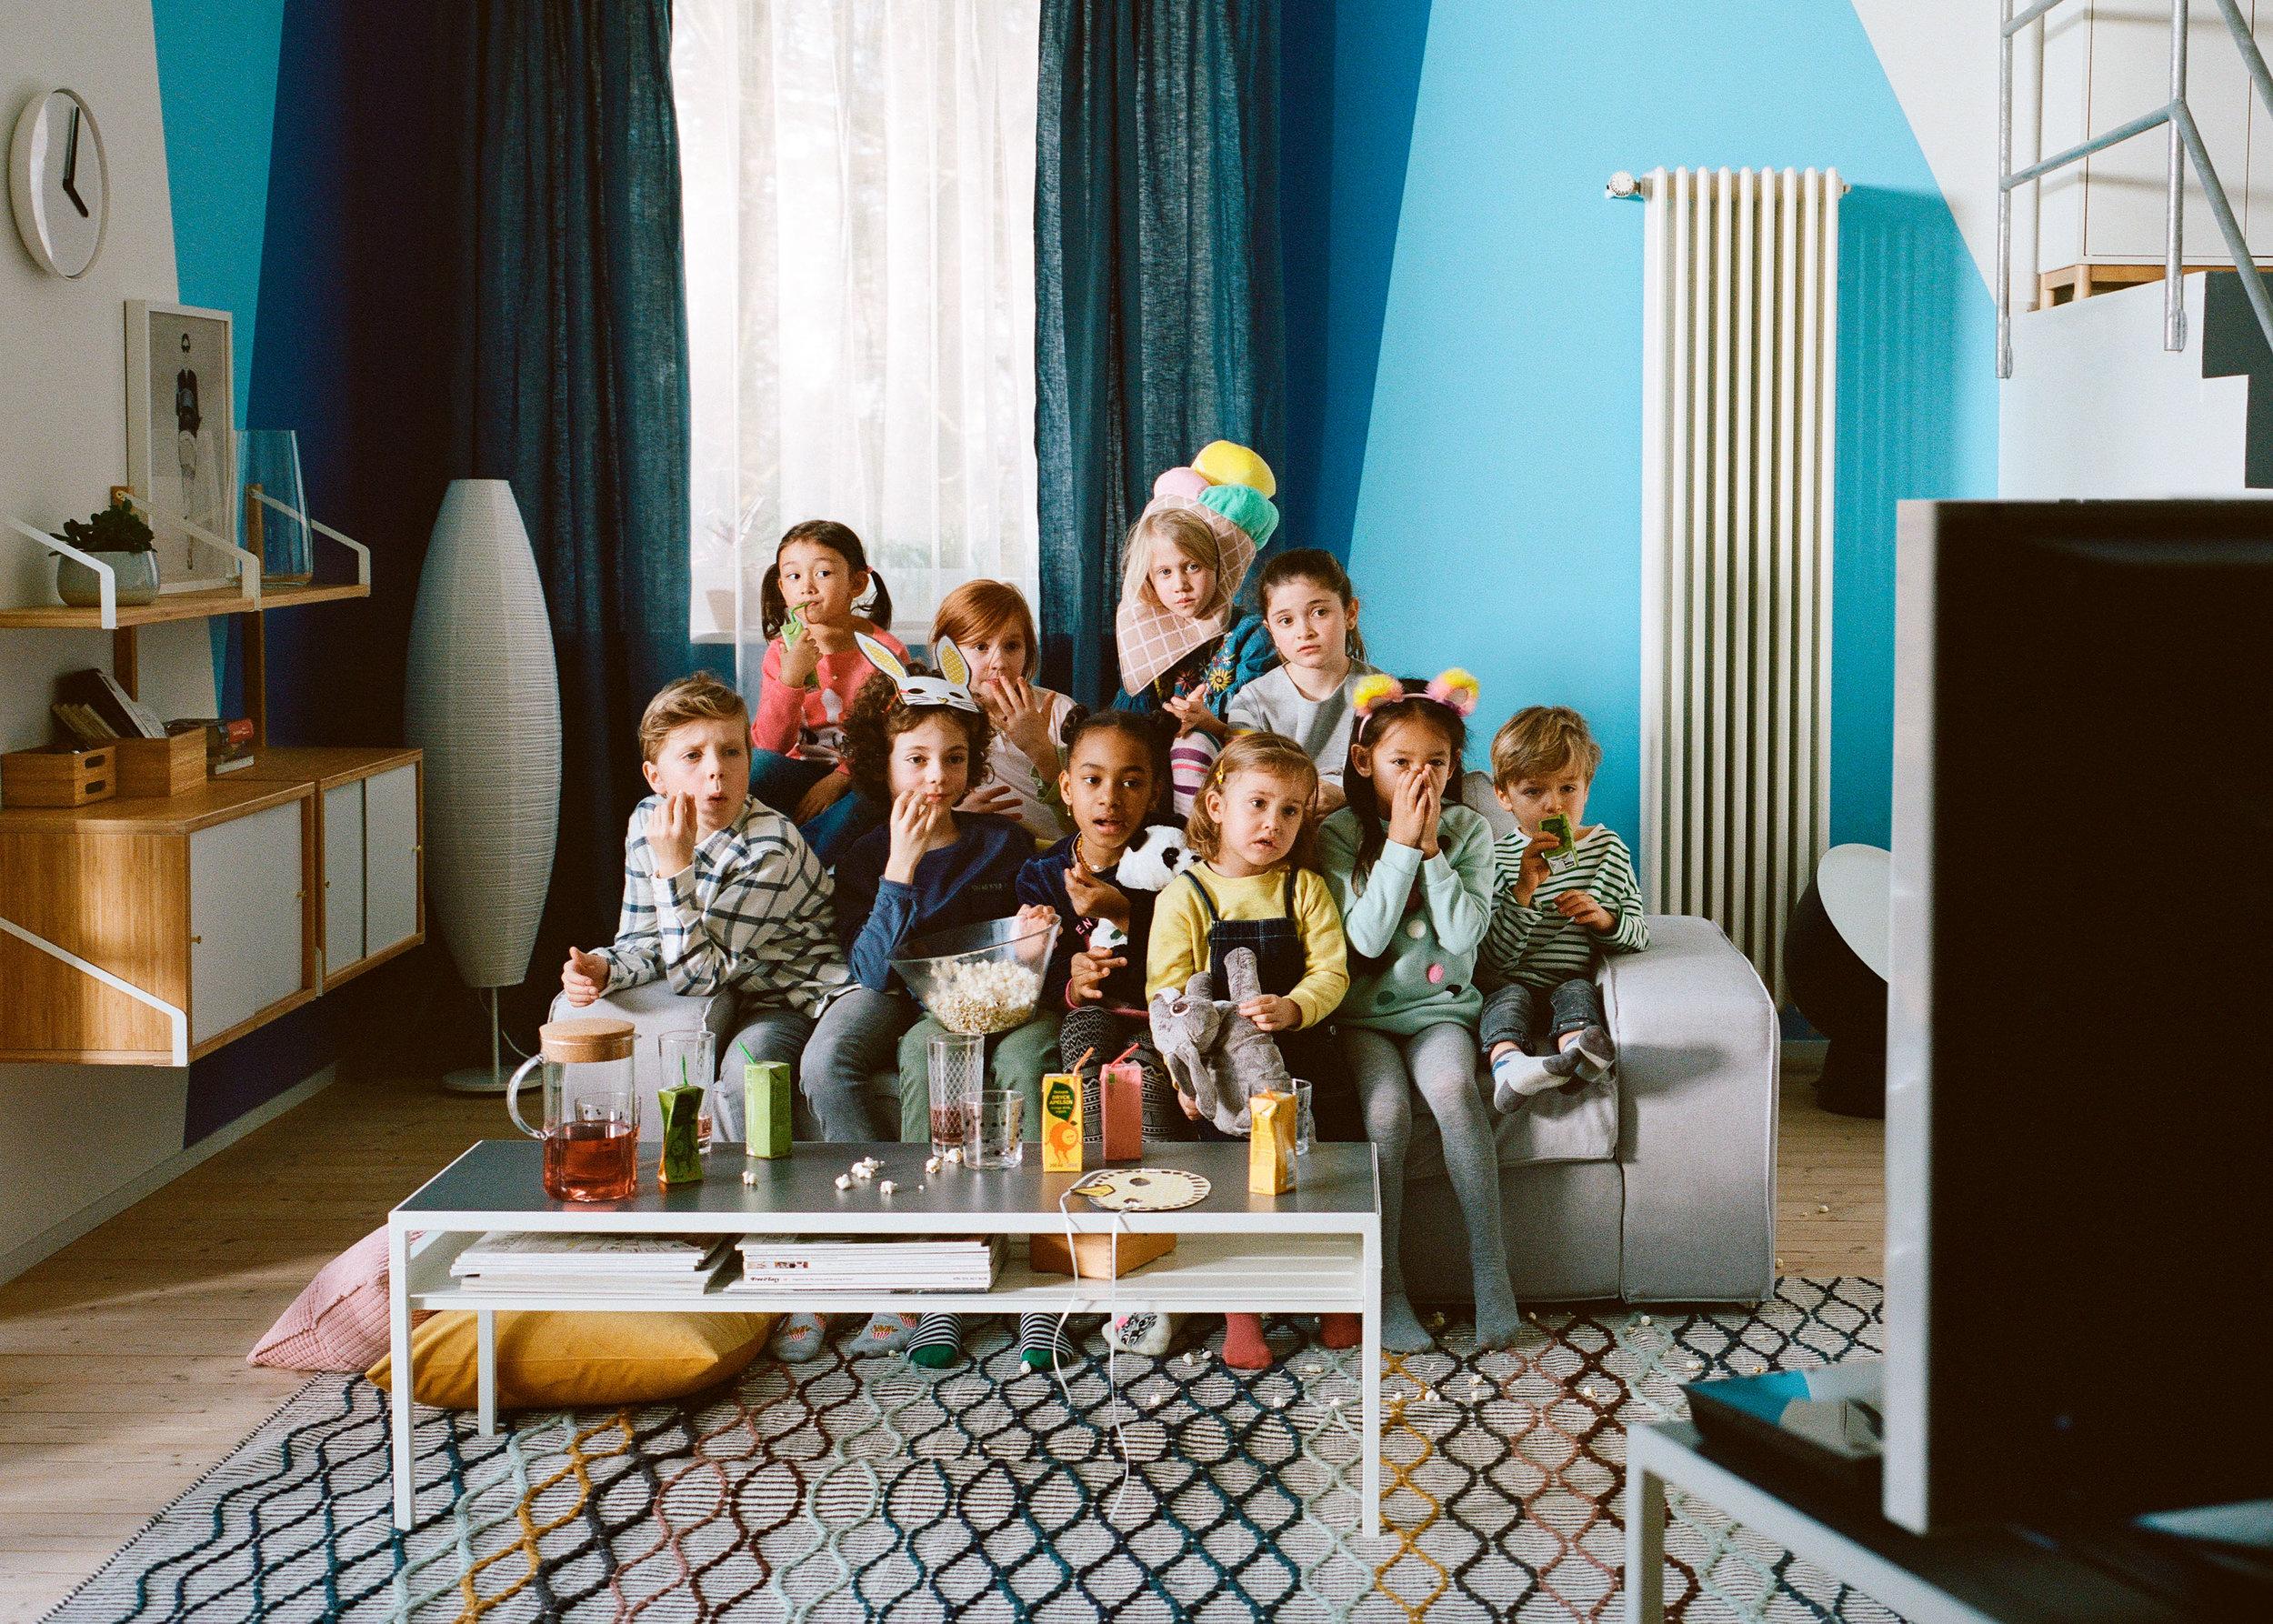 Lorenz-Wahl_IKEA_Cinema_Quer_RGB.jpg